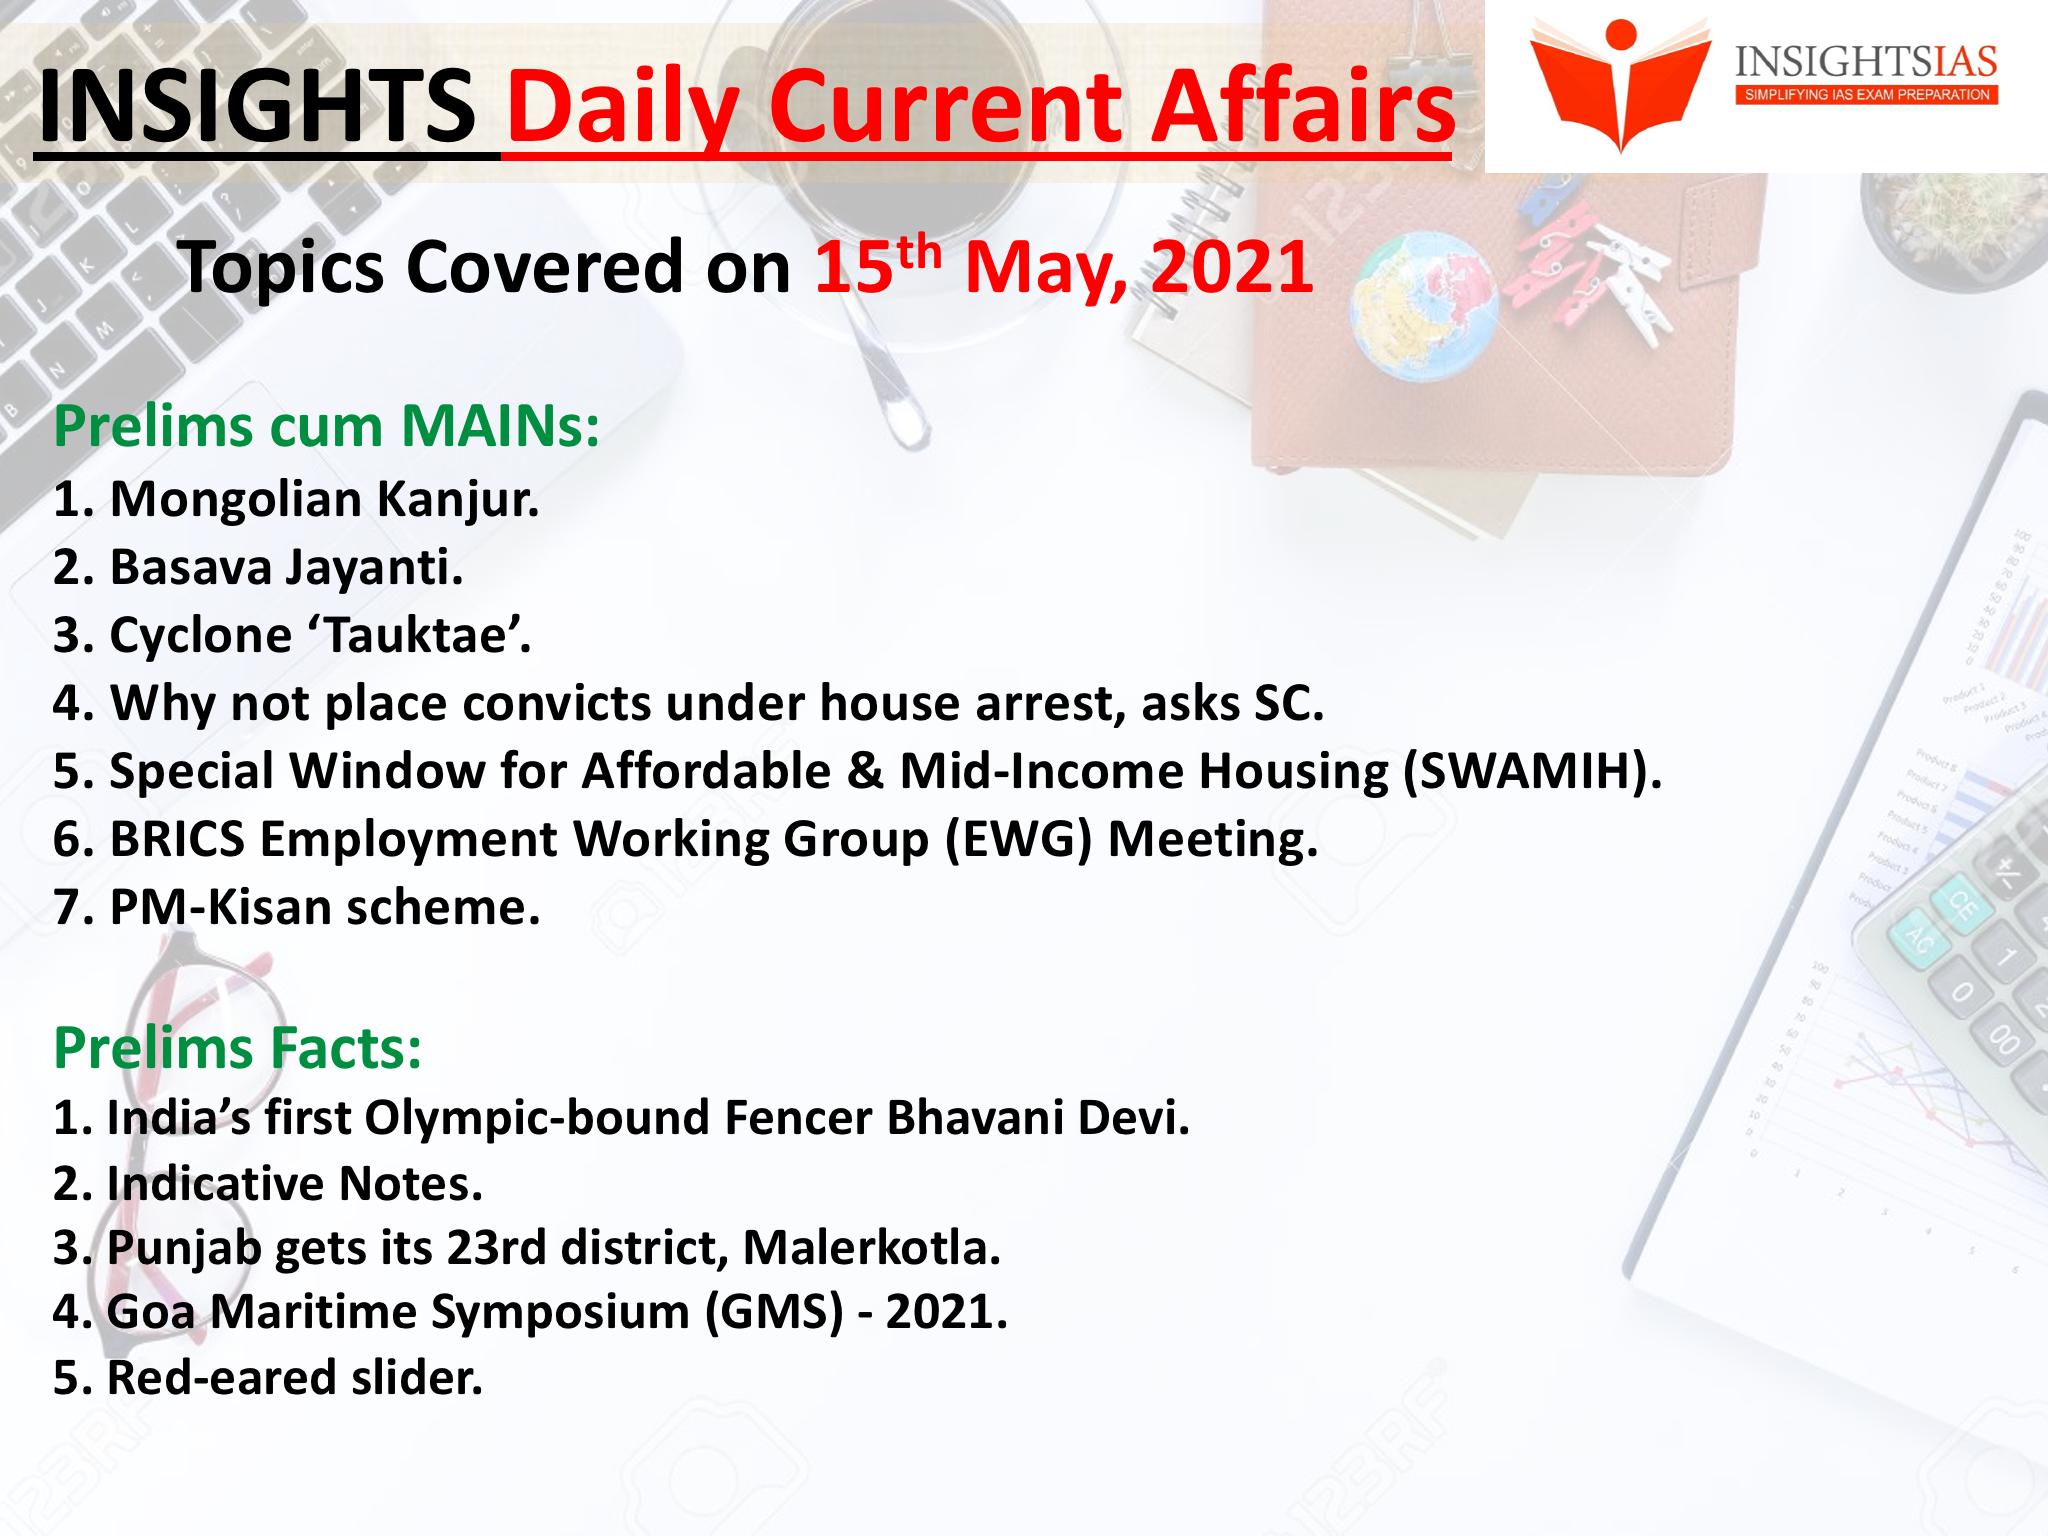 current affairs, current events, current gk, insights ias current affairs, upsc ias current affairs